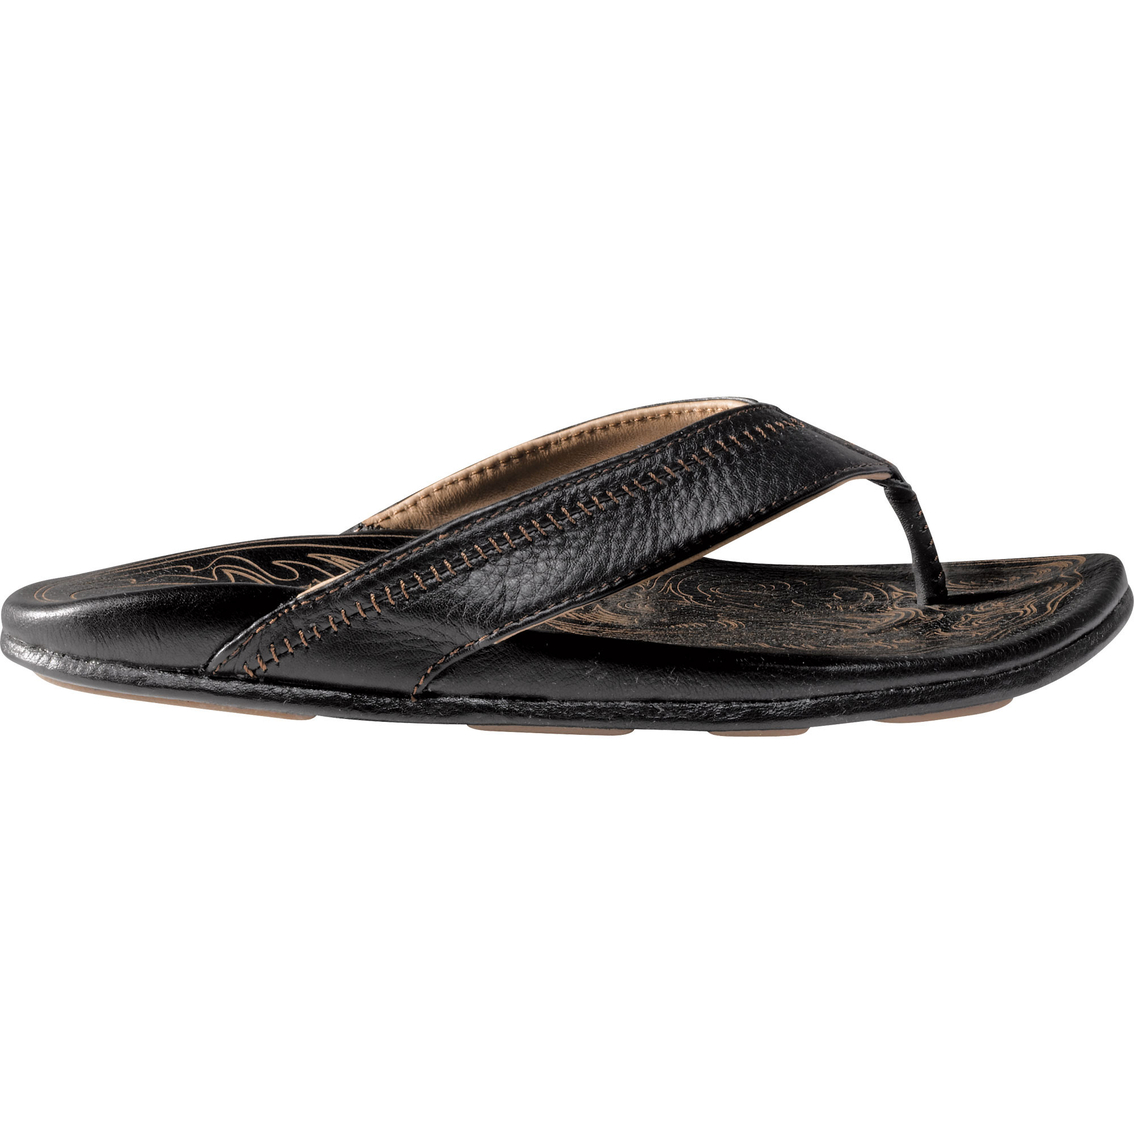 8dbbd5409f591b Olukai Men s Hiapo First Born Full Grain Whipstitch Leather Sandals ...